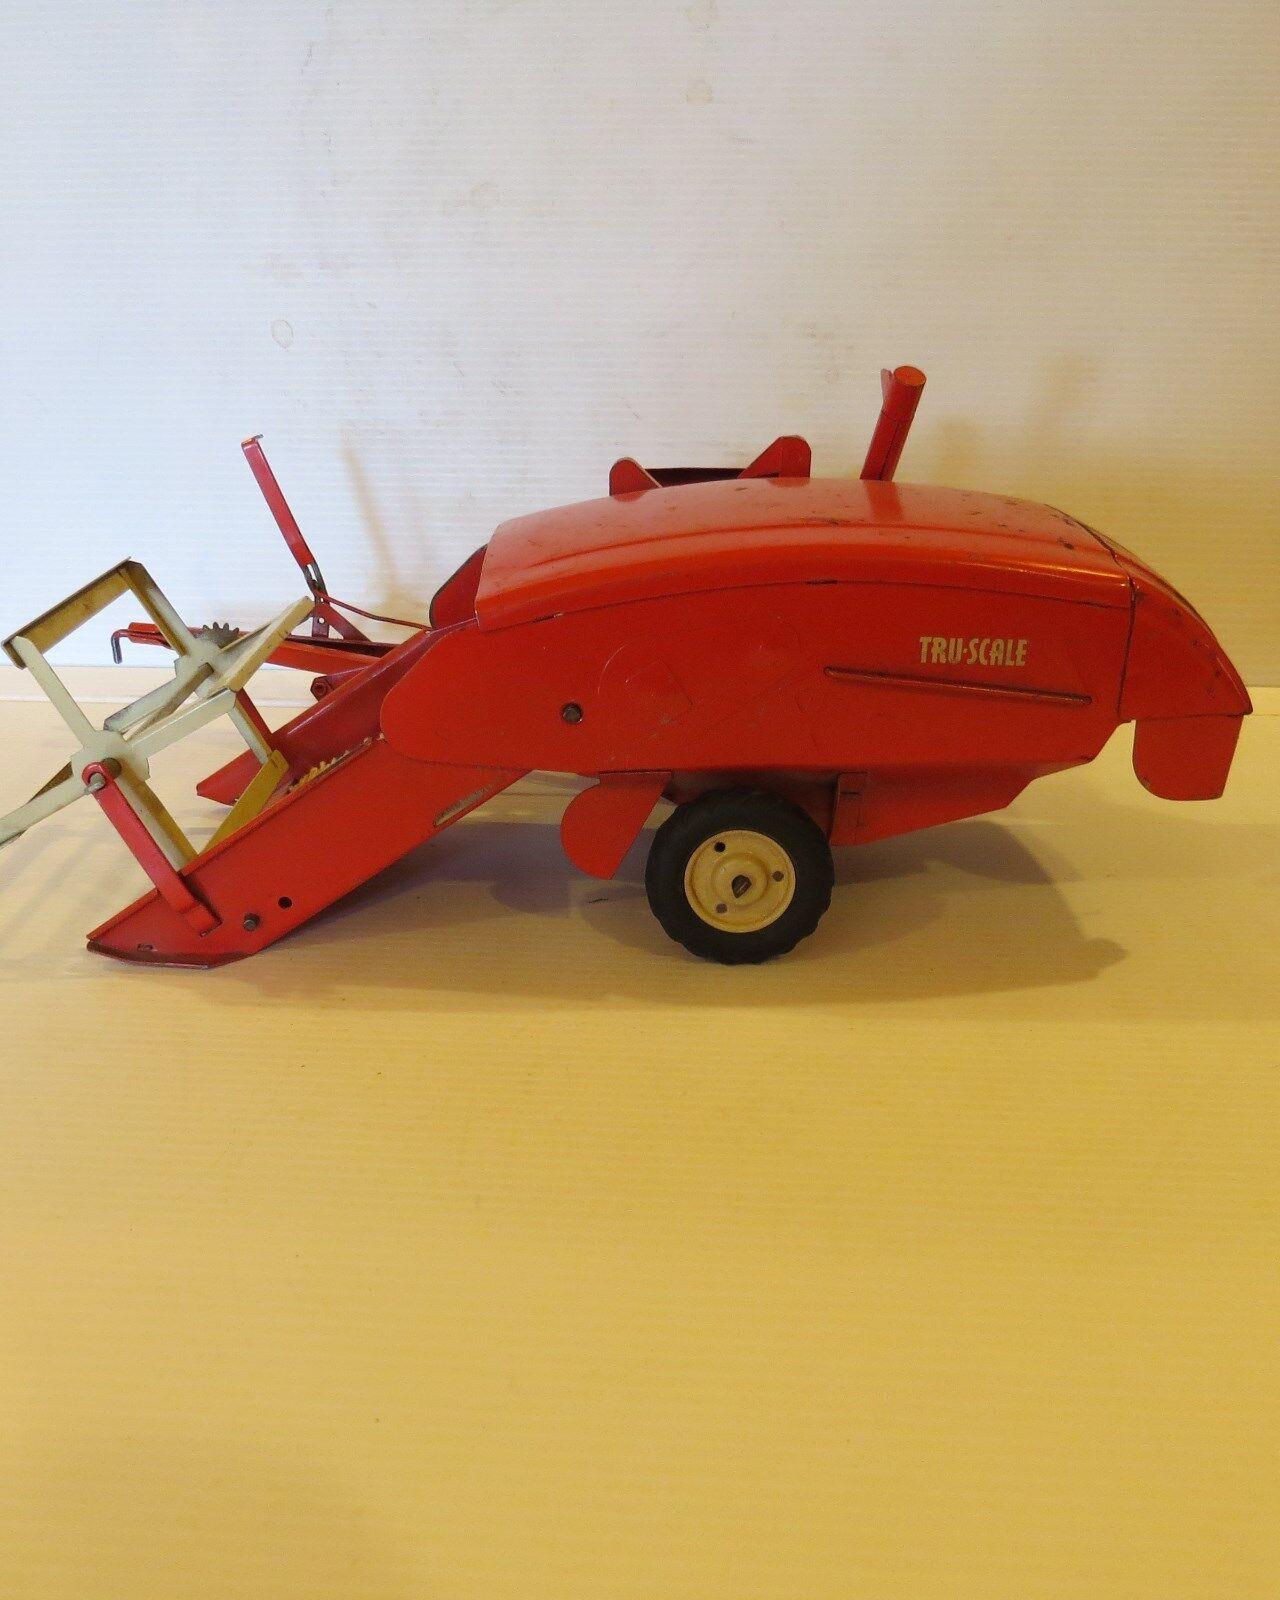 diseños exclusivos 1954 Tru-Scale Tire Tire Tire Tipo combinar Rojo TS034  moda clasica